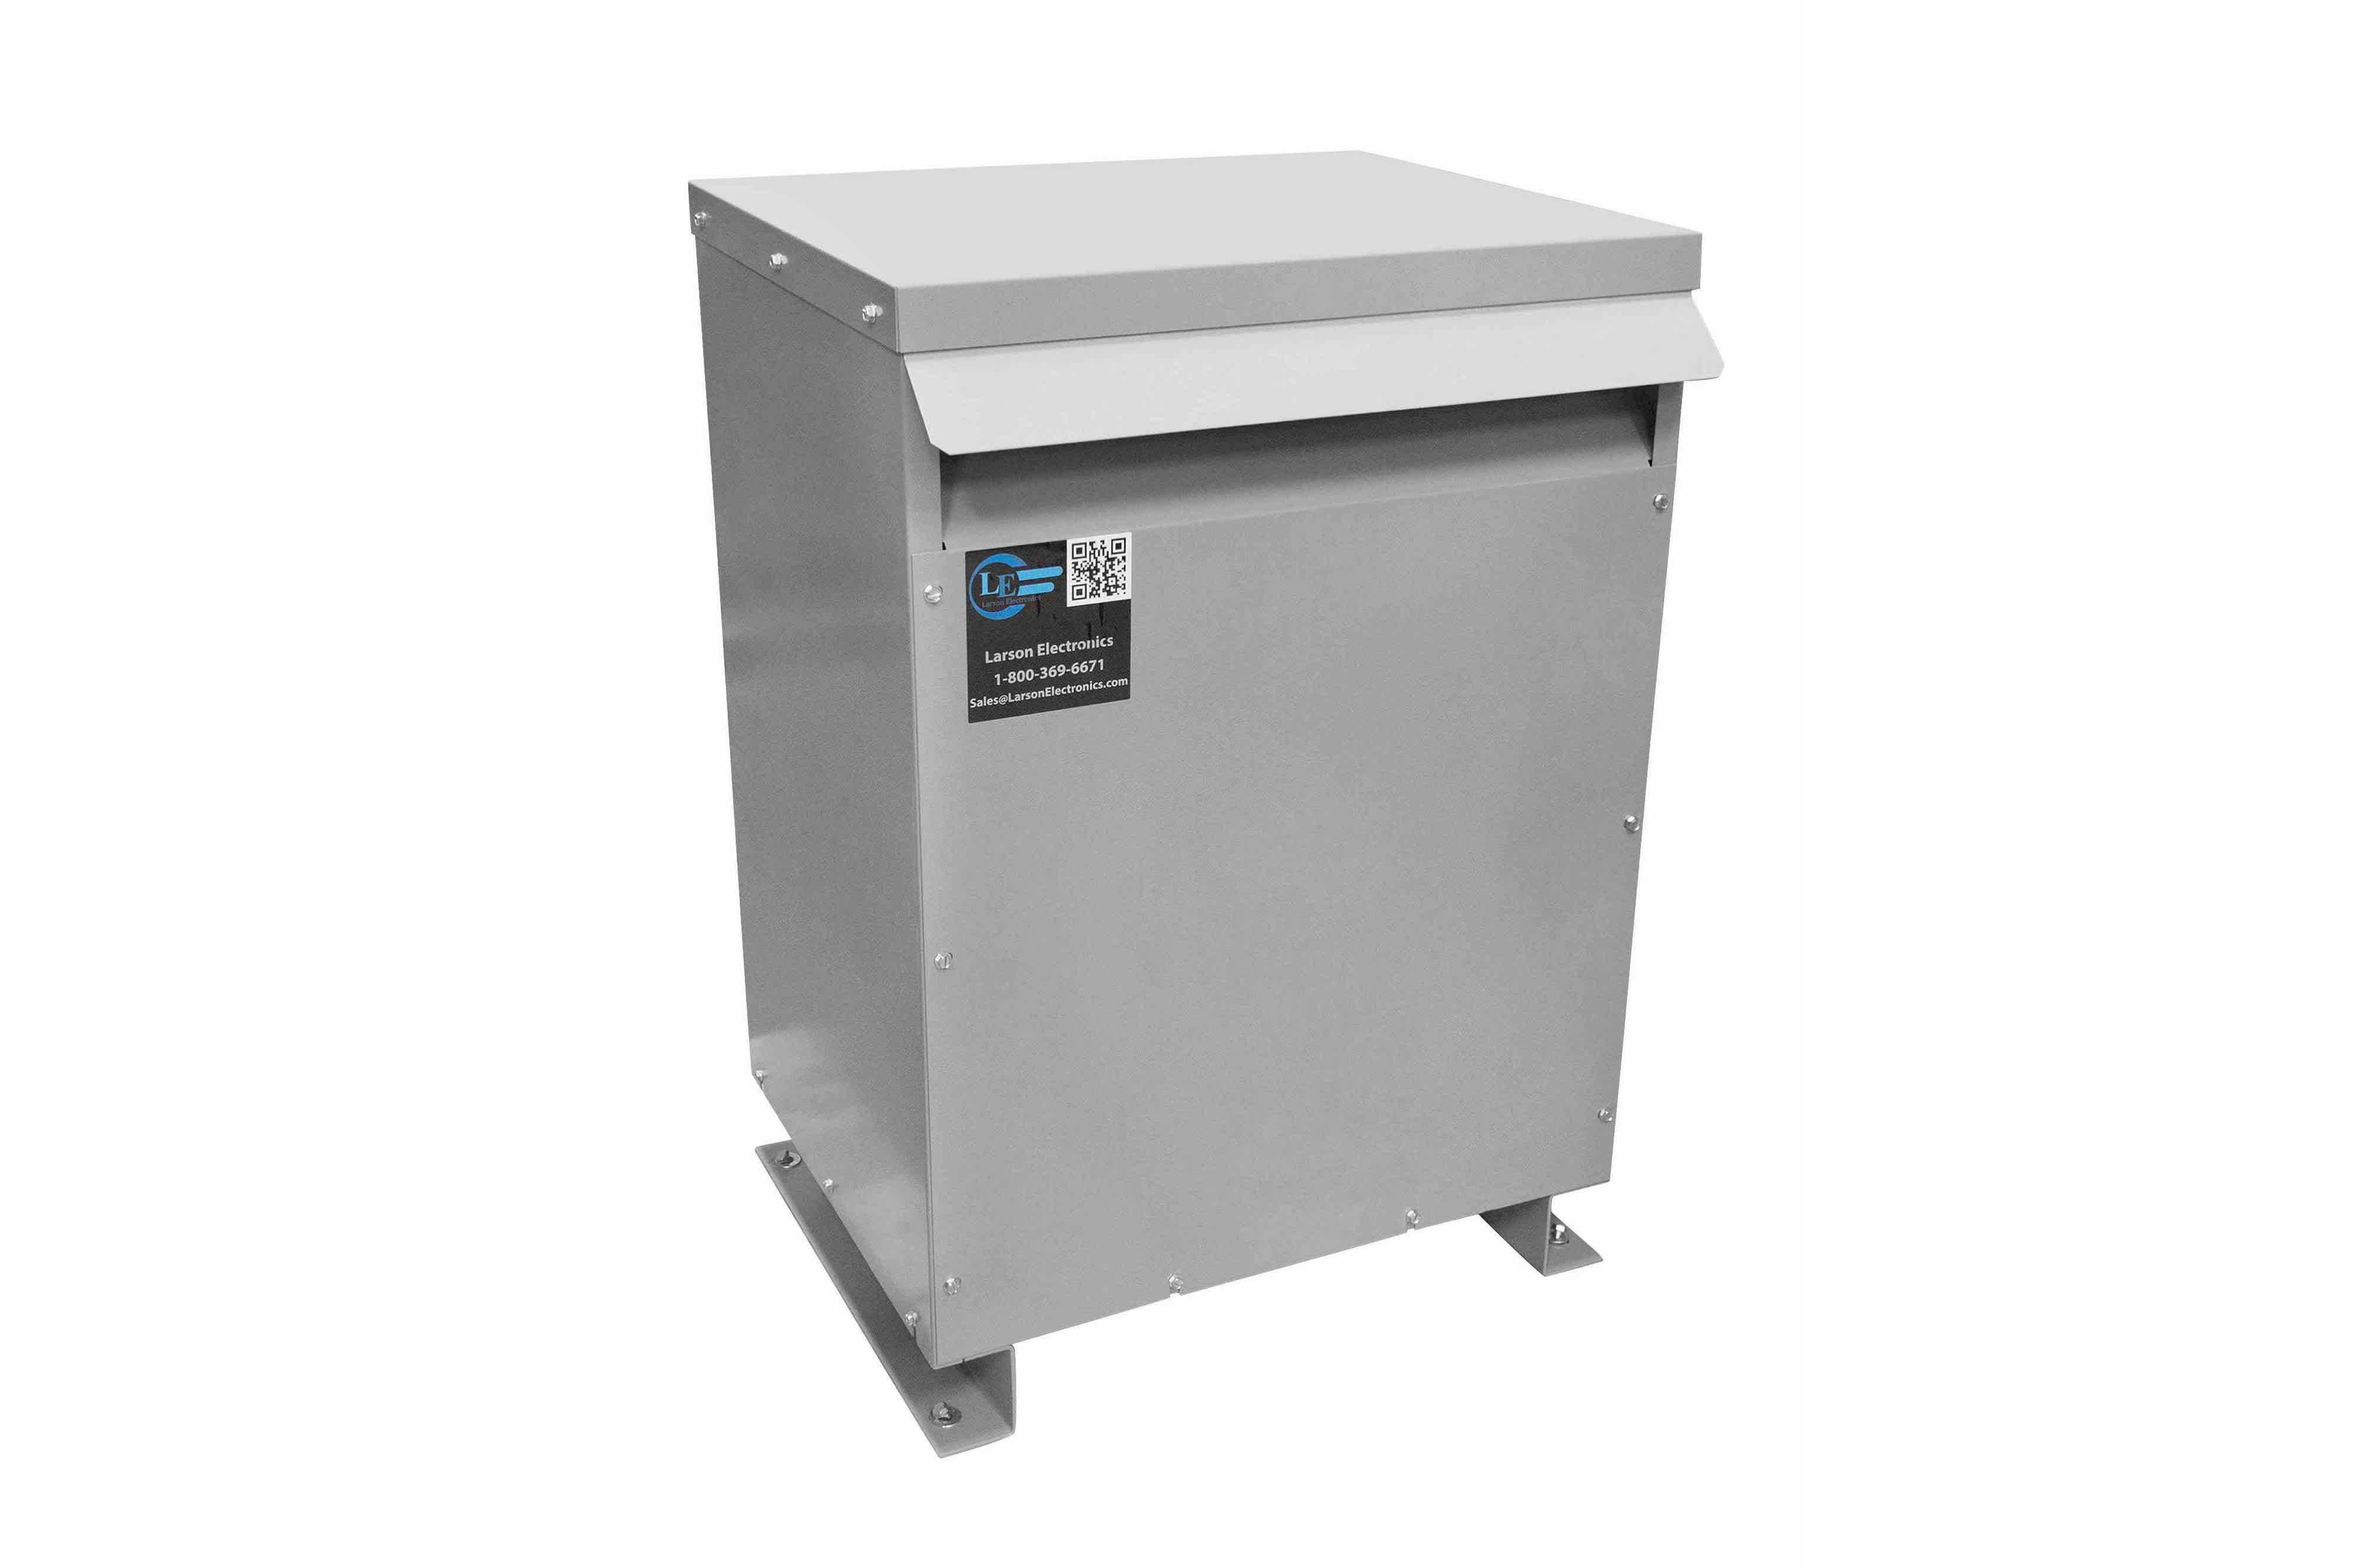 36 kVA 3PH Isolation Transformer, 208V Wye Primary, 400V Delta Secondary, N3R, Ventilated, 60 Hz